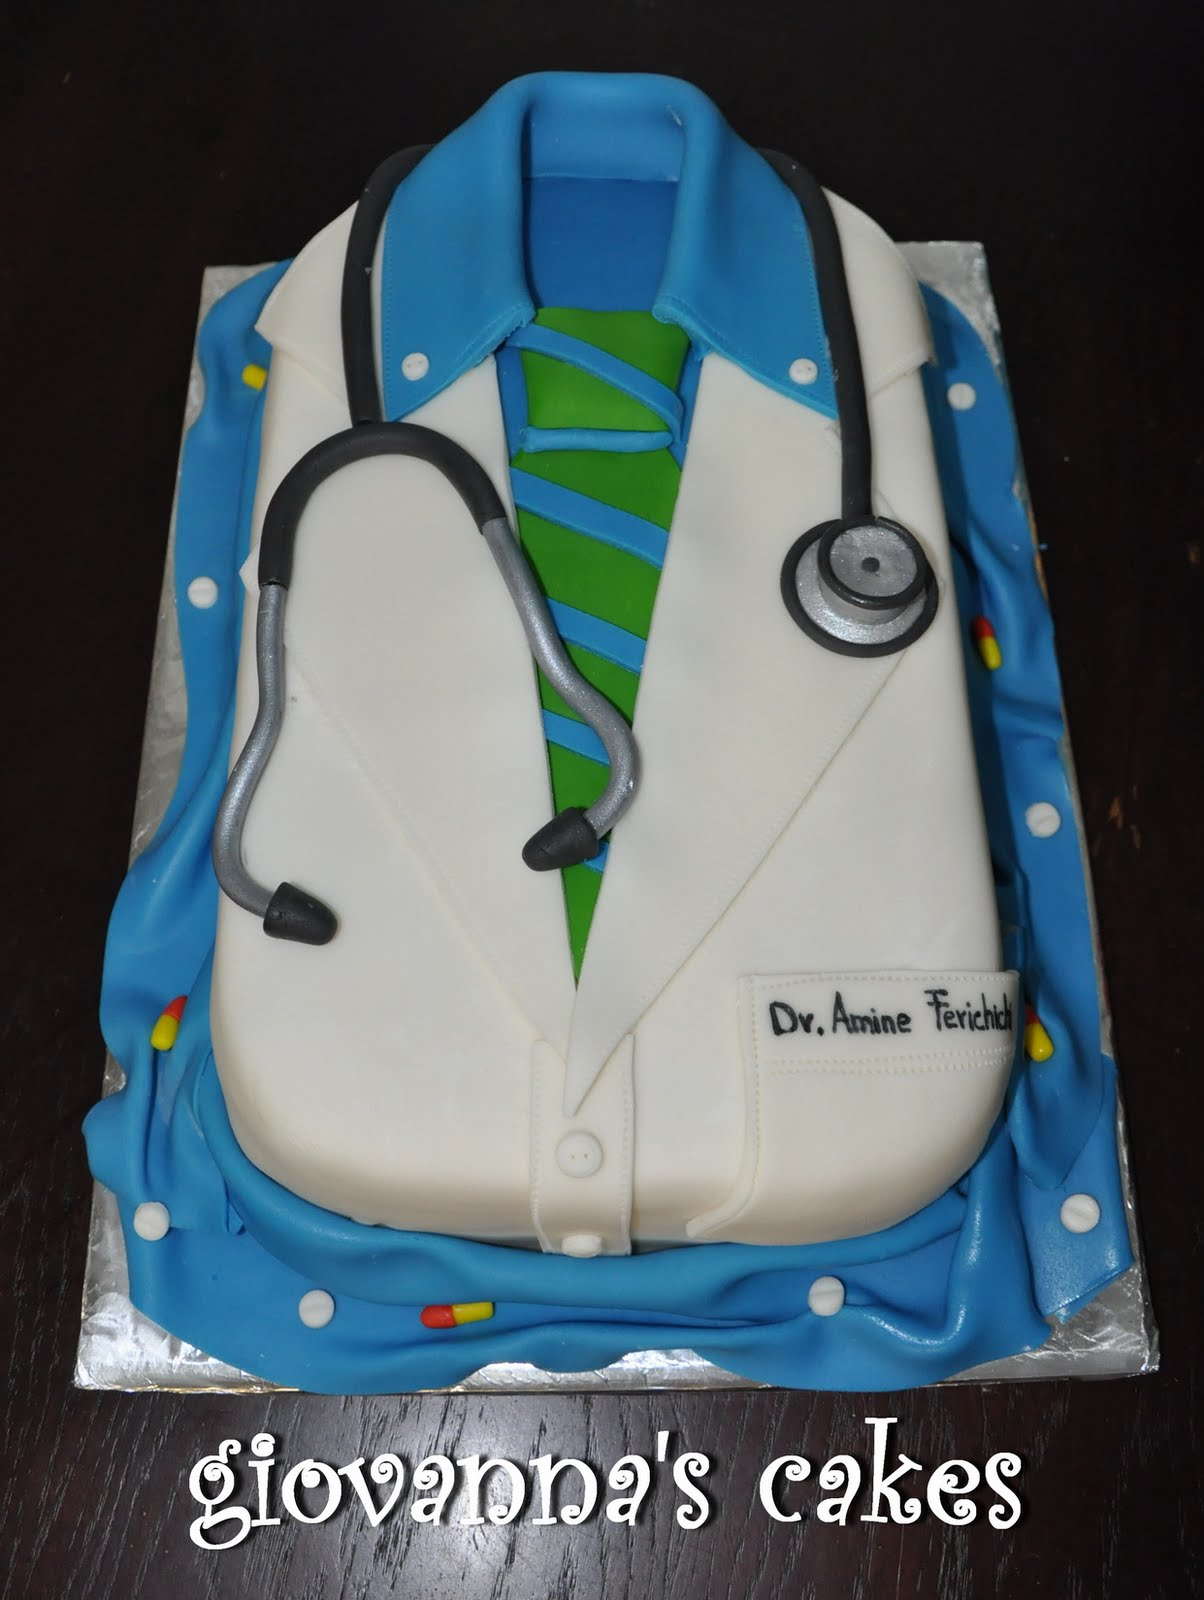 Giovannas Cakes Medical Doctor Robe Cake